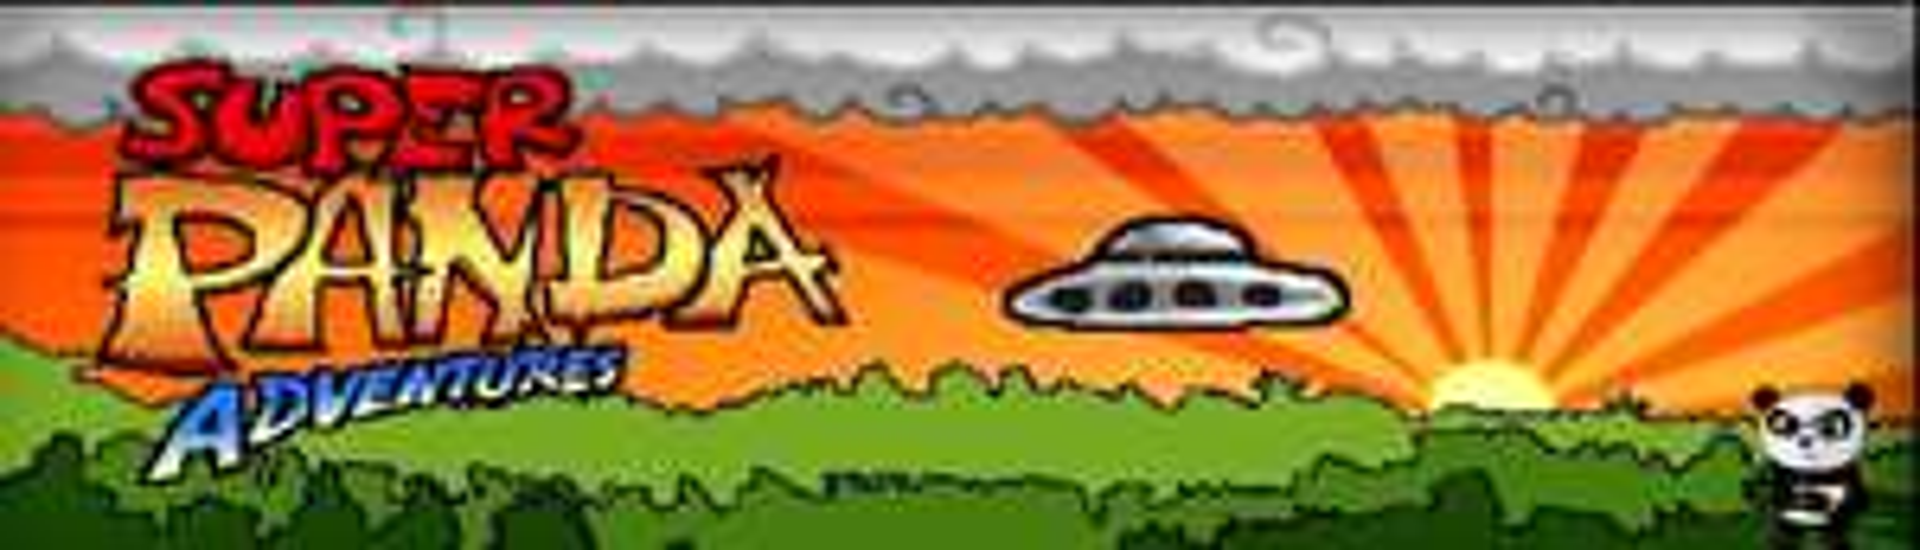 Super Panda Adventures (Plattformer) kostenlos bei Indiegala